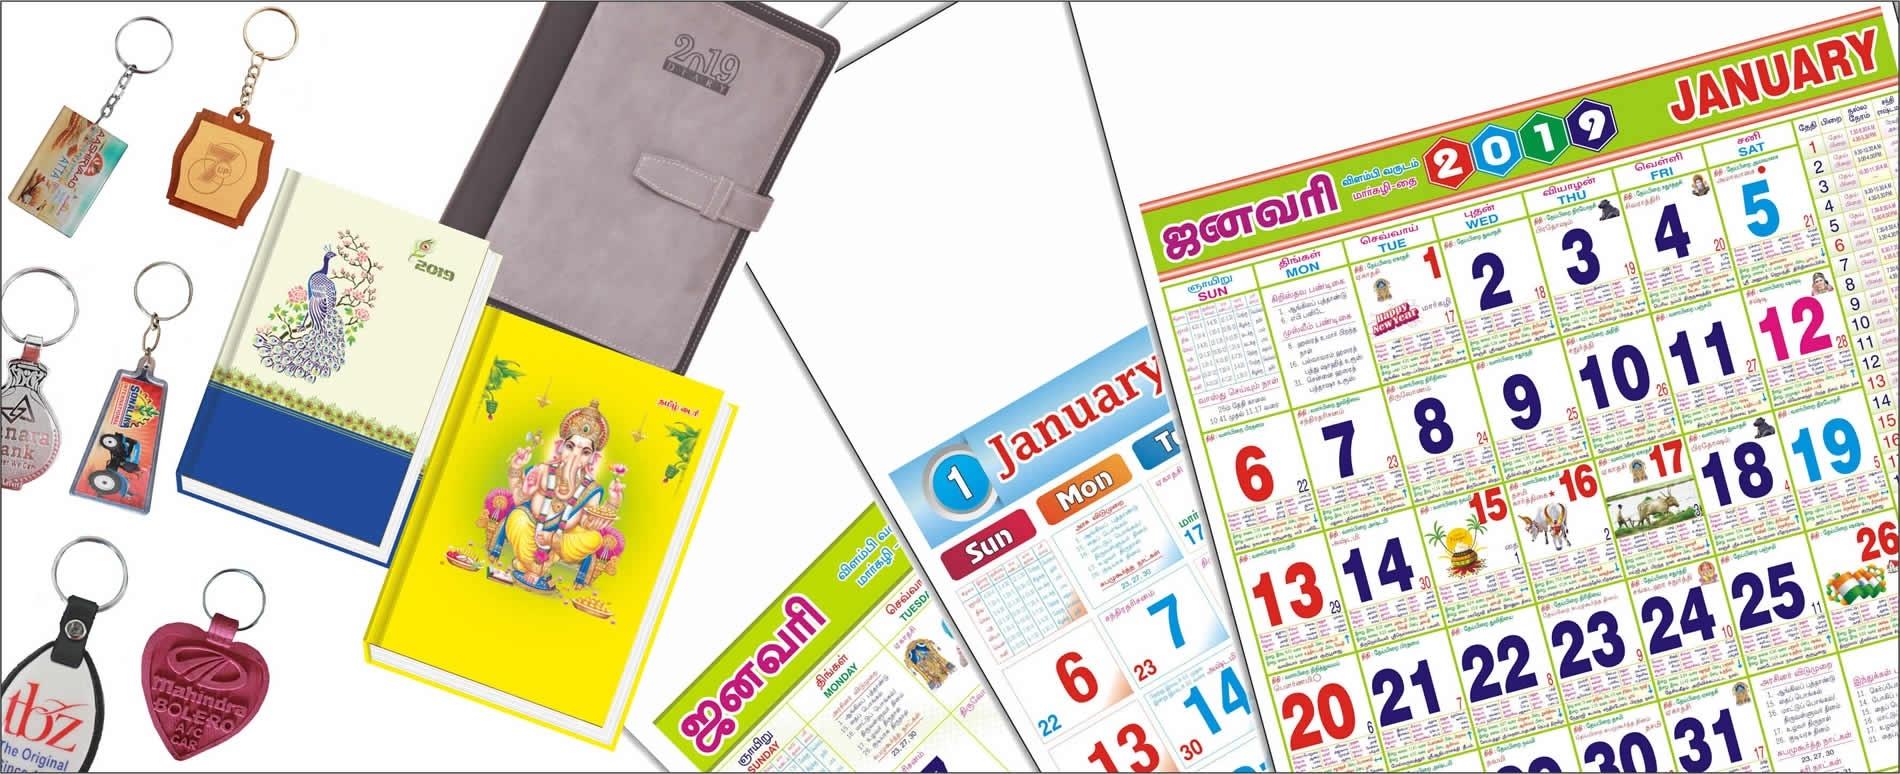 Sibhu Prints - Monthly Calendar, Offset Printing, Keychain_Calendar Printing In Sivakasi